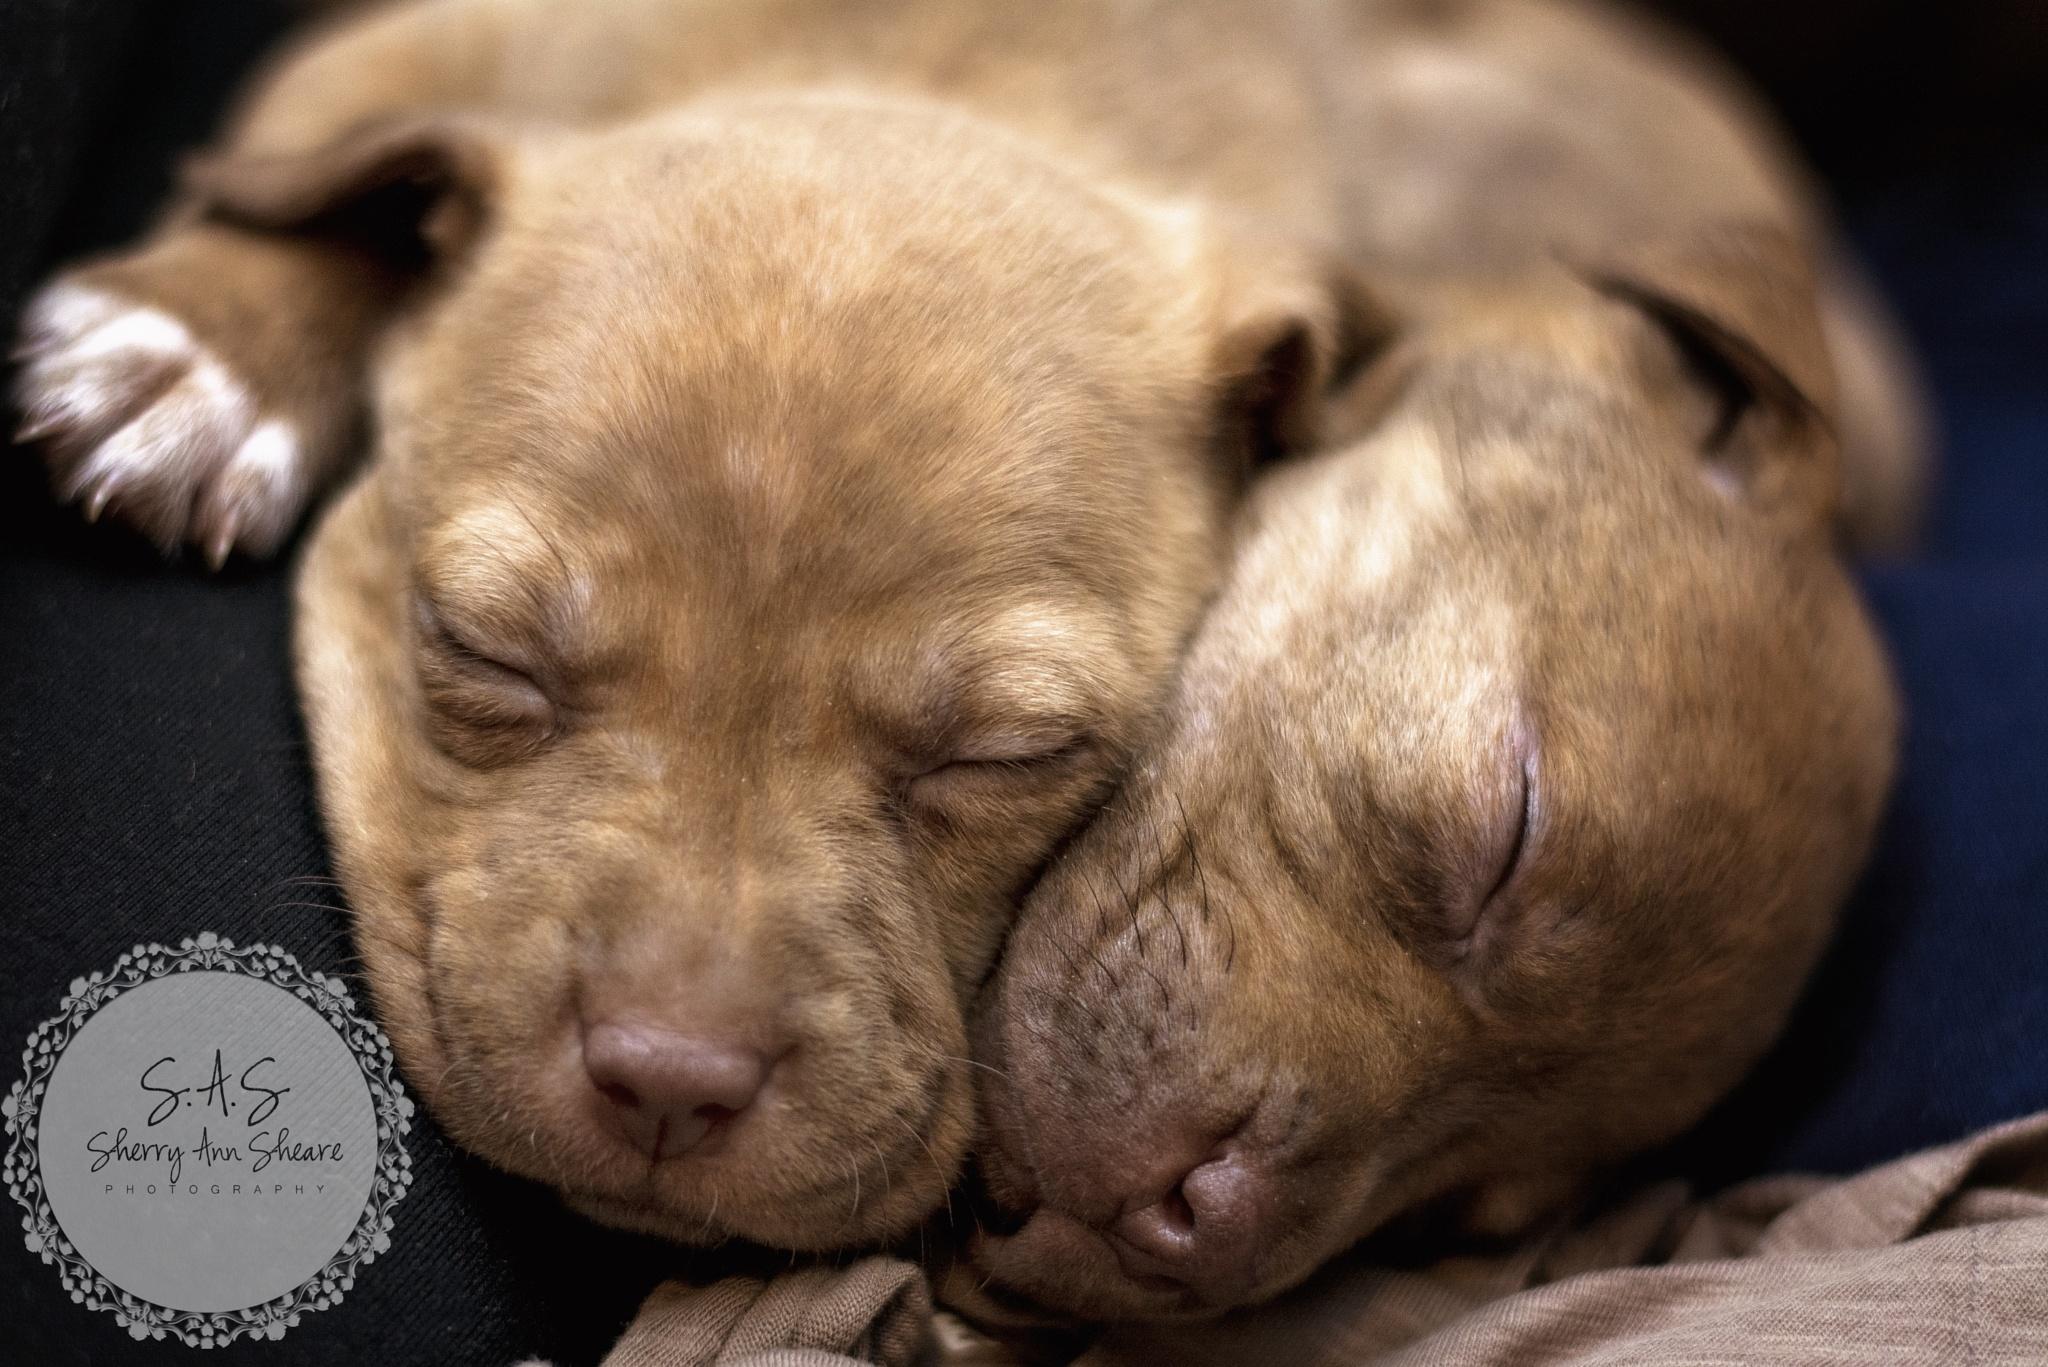 Sibling Pups by Sherry Ann Sheare